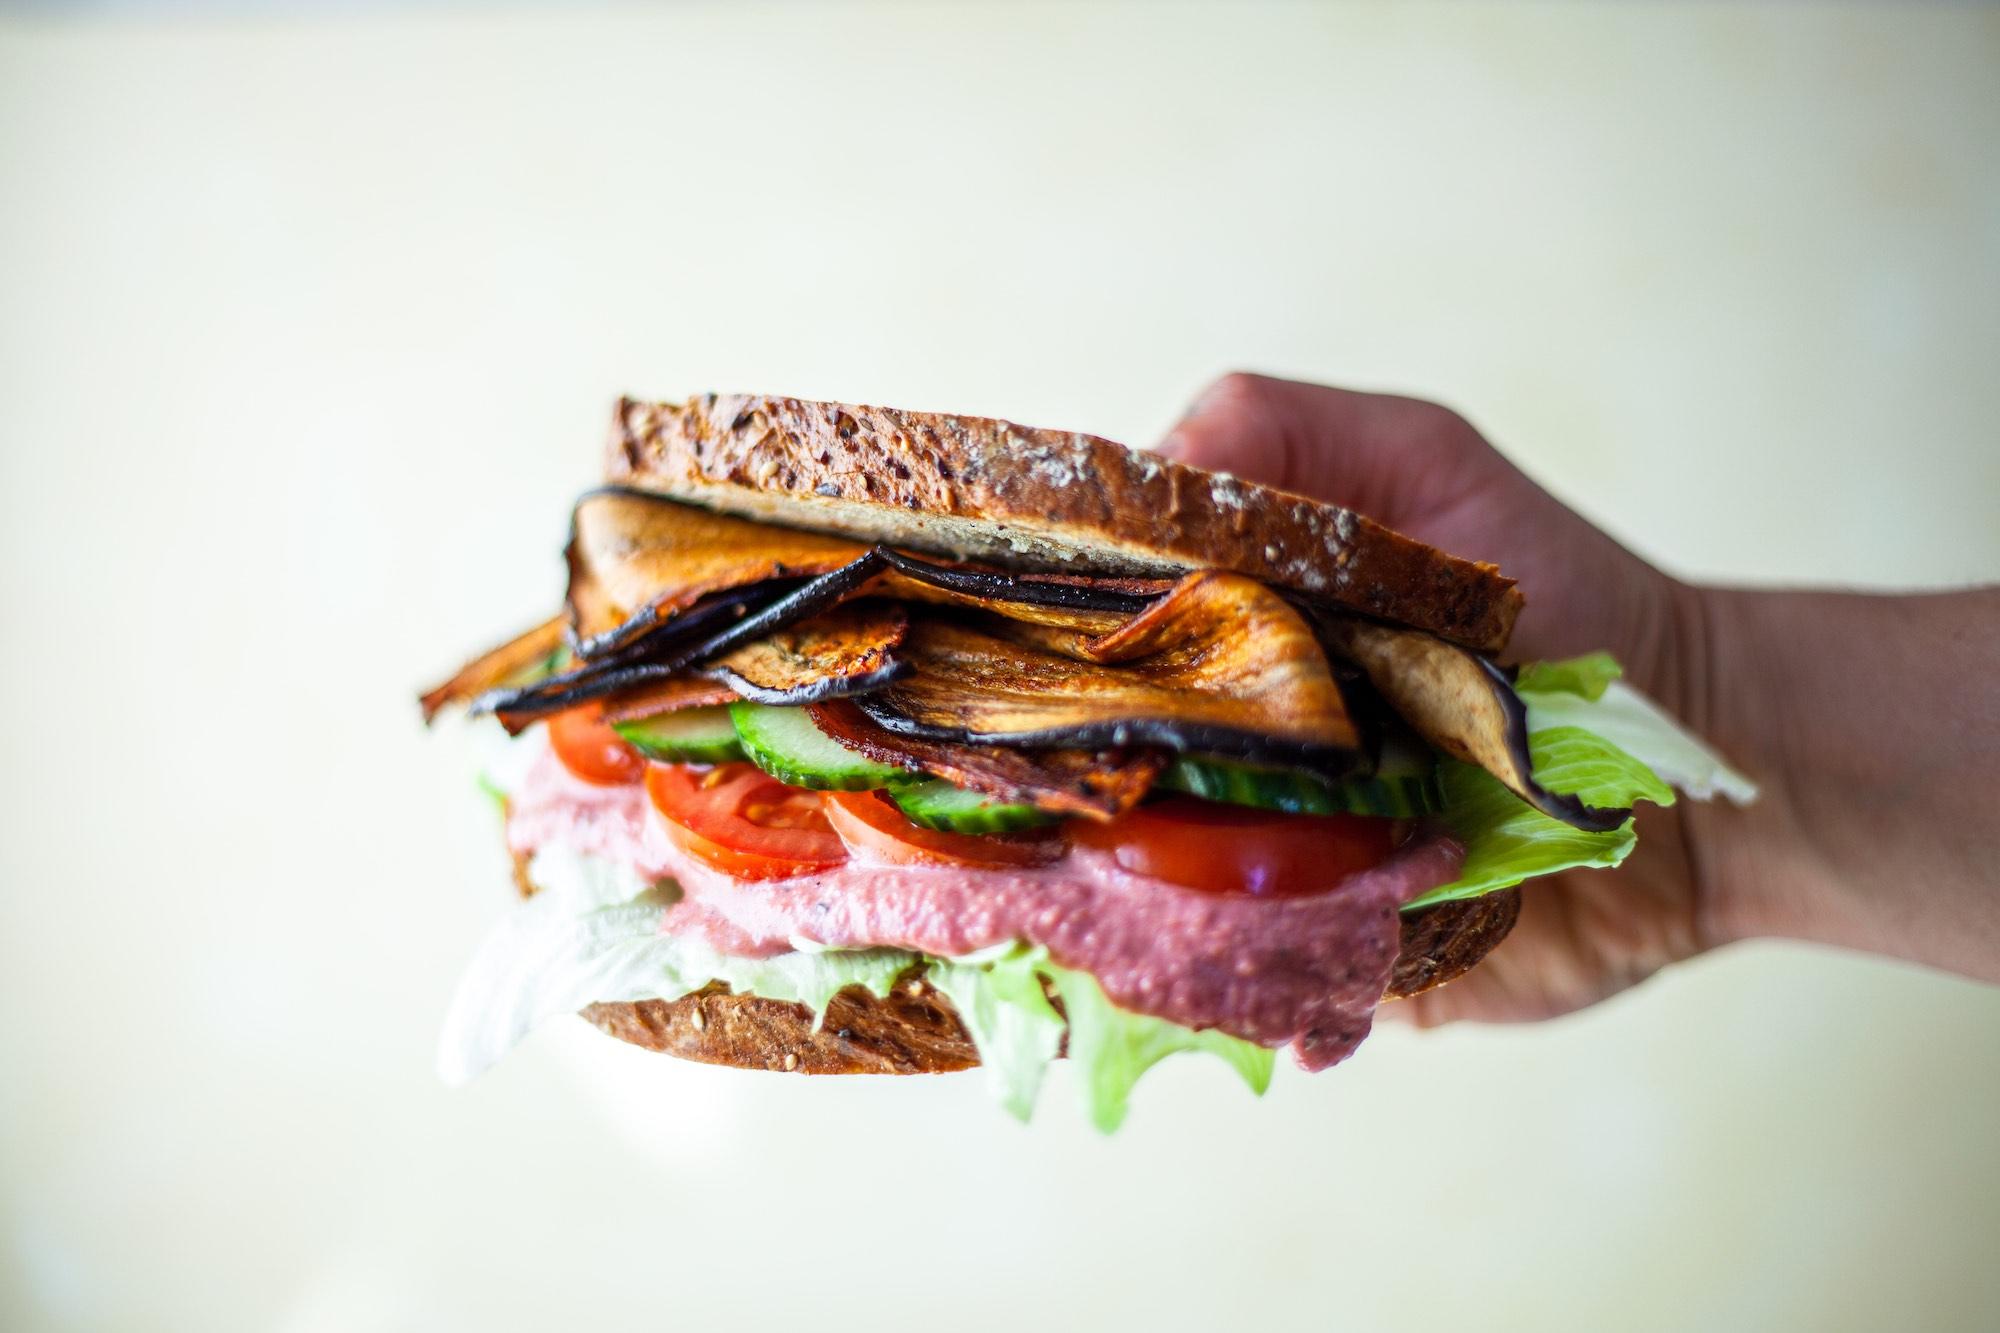 Aubergine Toasted Sandwich